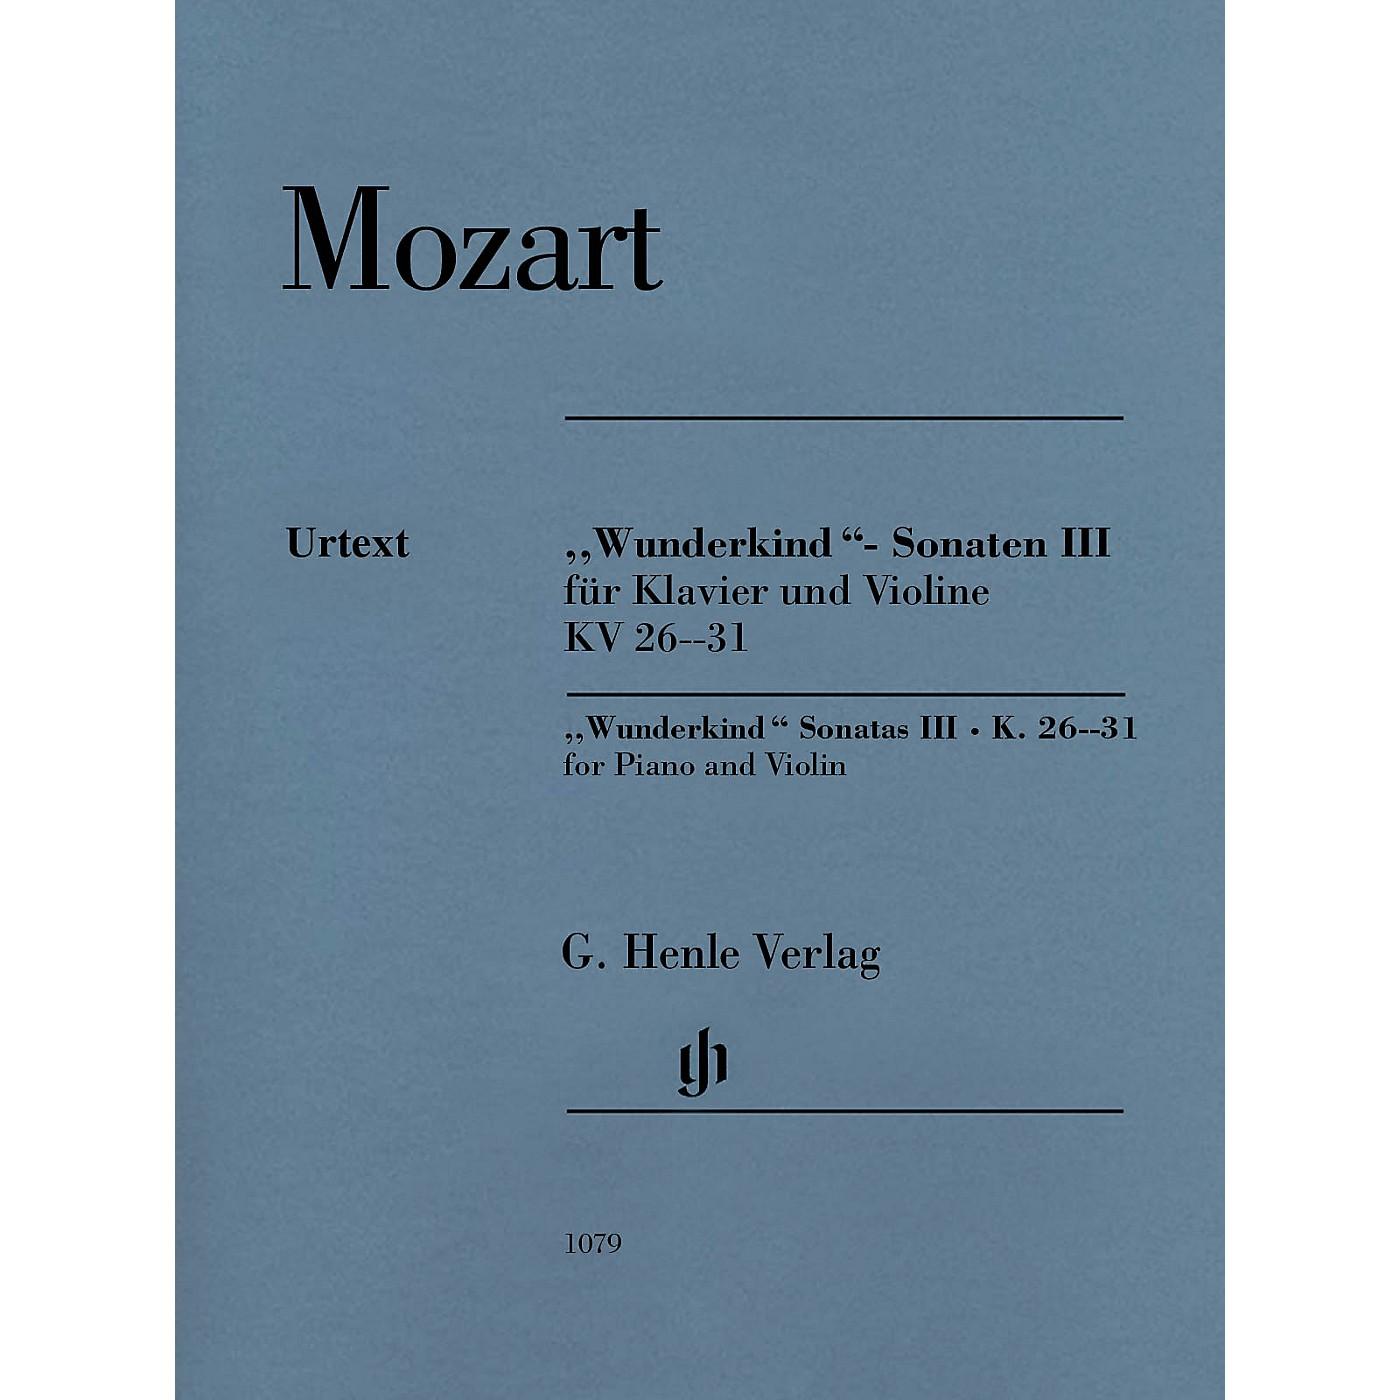 G. Henle Verlag Mozart - Wunderkind Sonatas, Volume 3, K. 26-31 Henle Music Softcover Edited by Wolf-Dieter Seiffert thumbnail